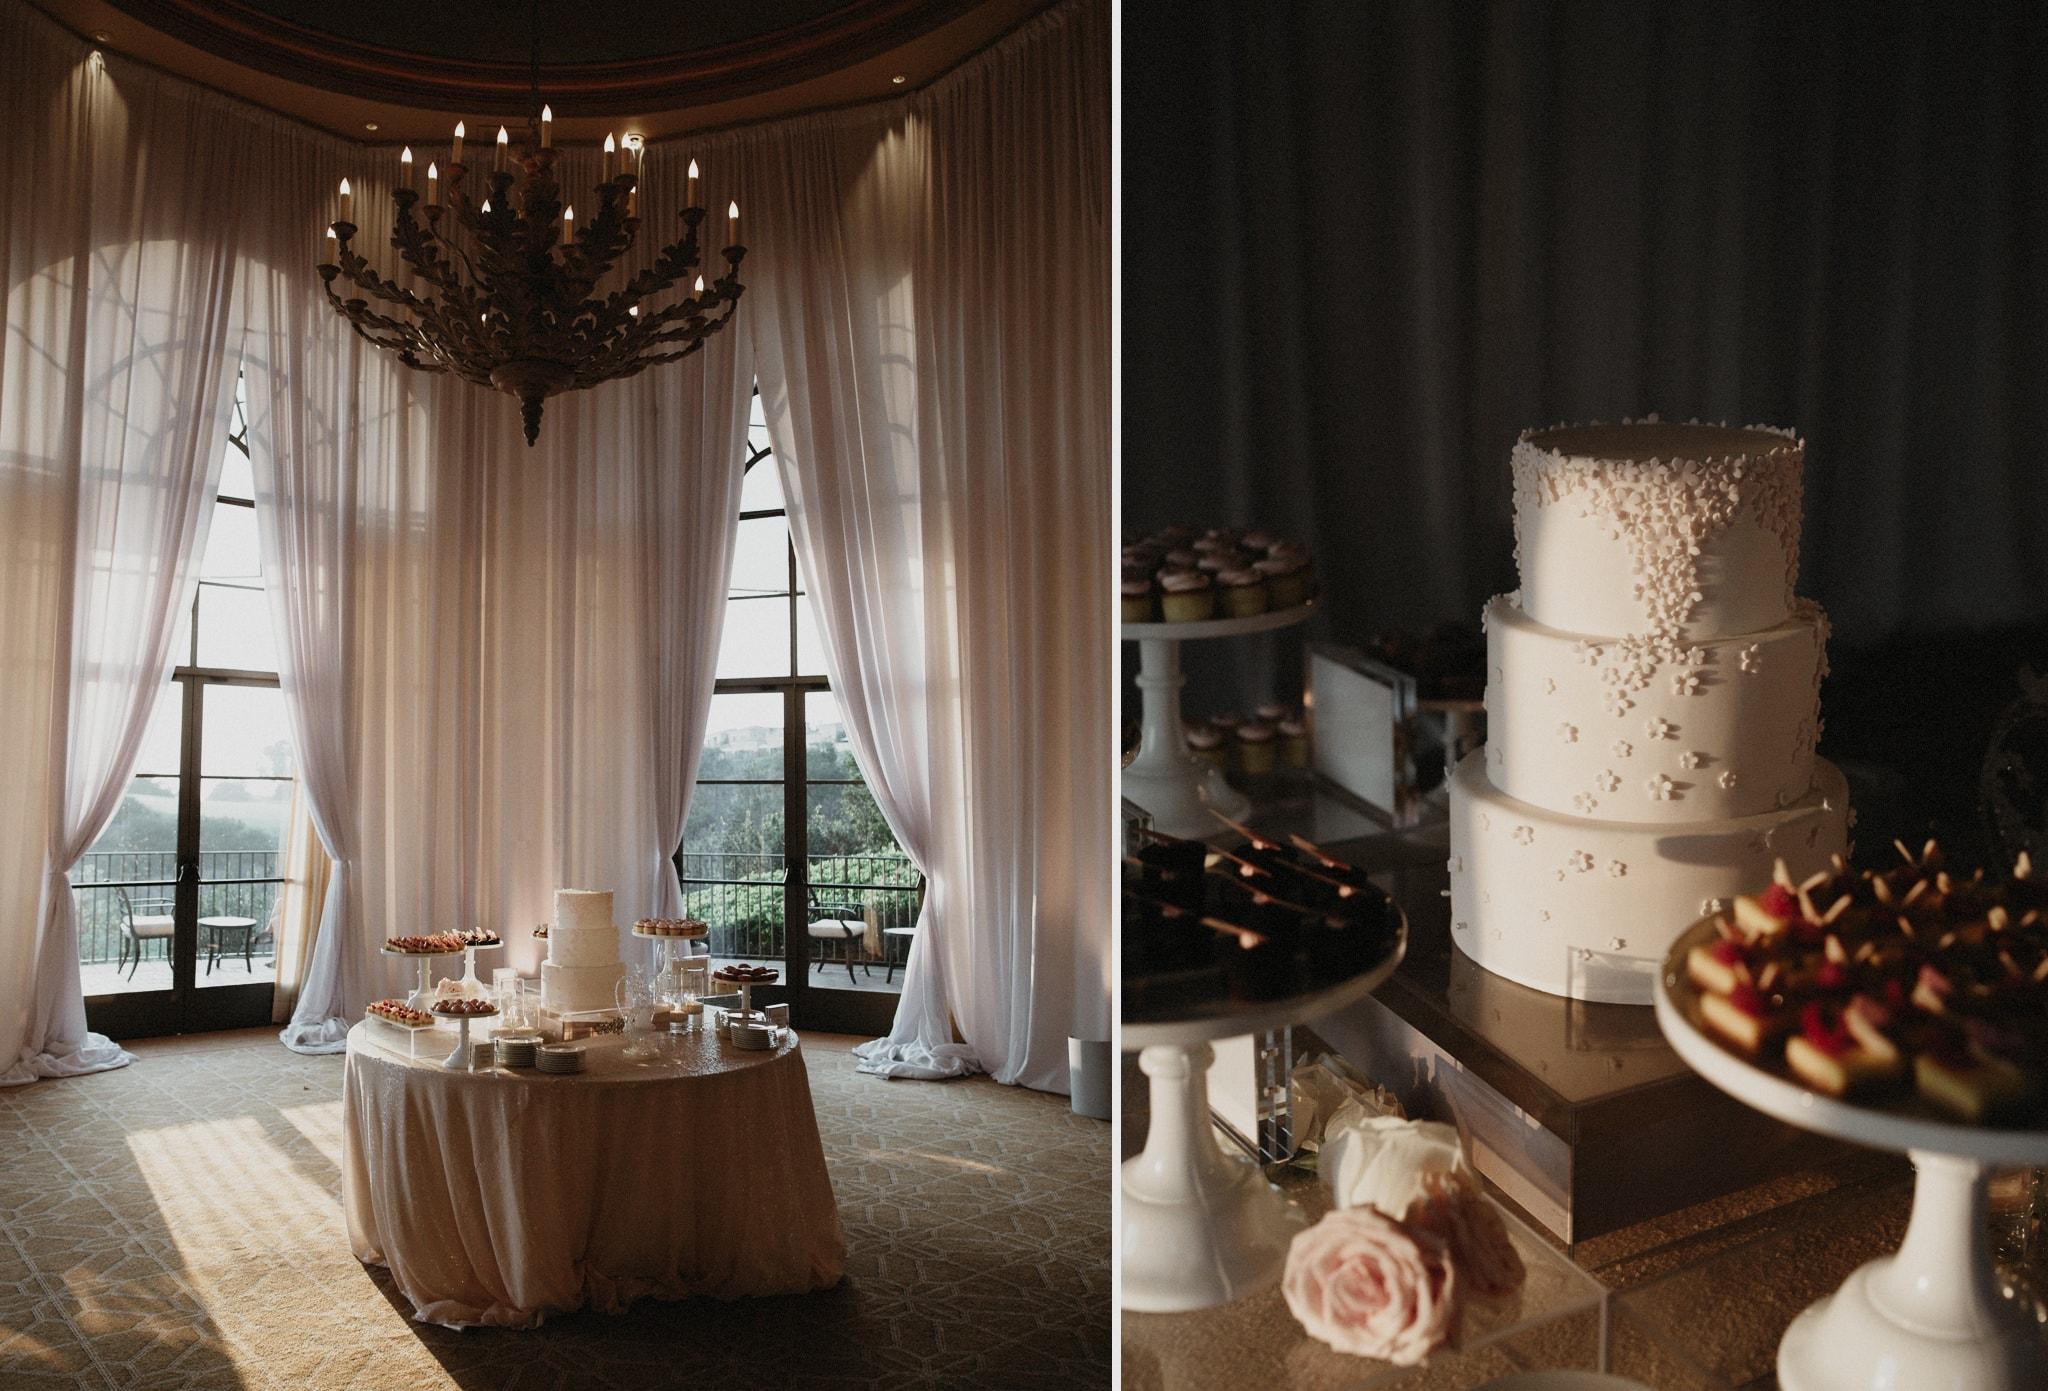 063-wedding-reception-venue-ideas.jpg